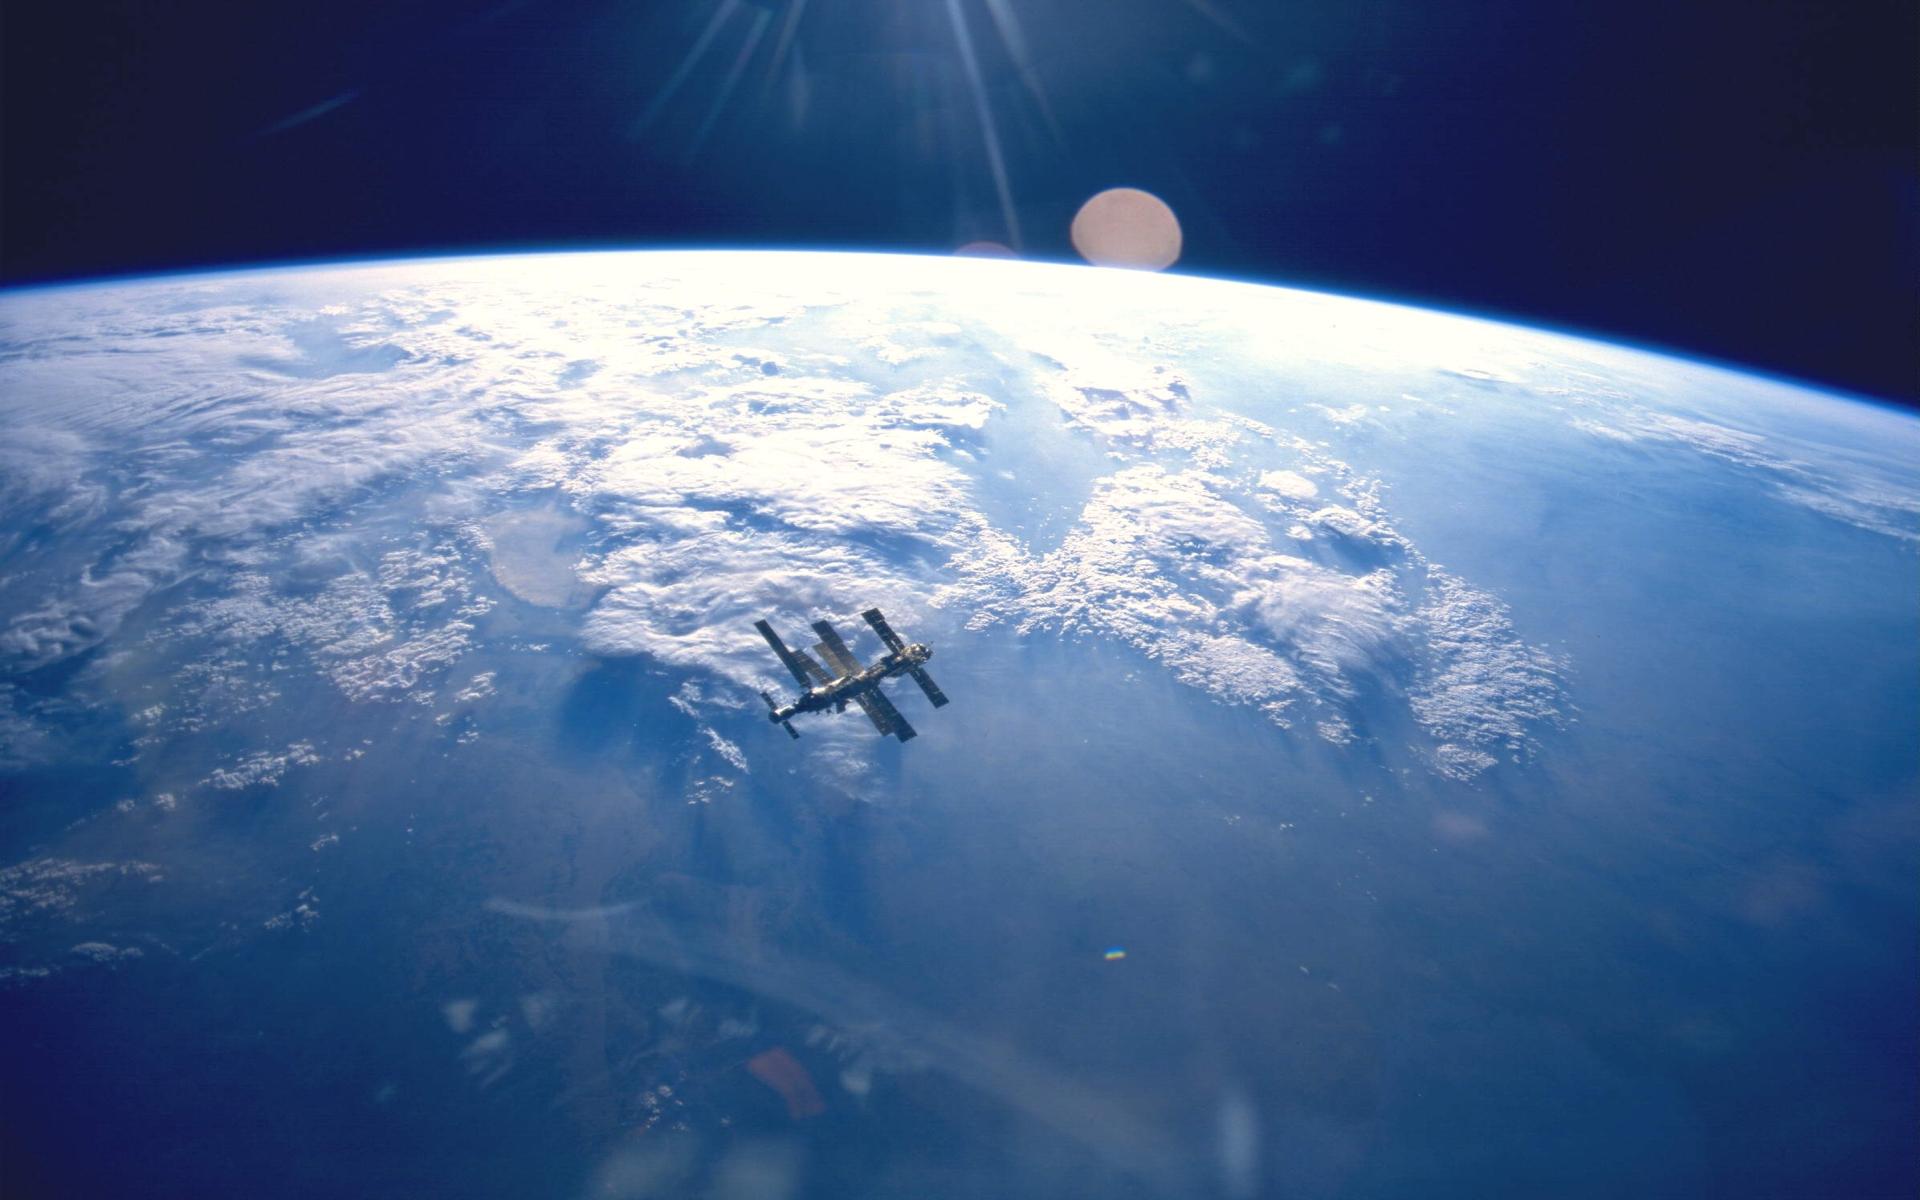 Earth from space hd wallpaper - SF Wallpaper